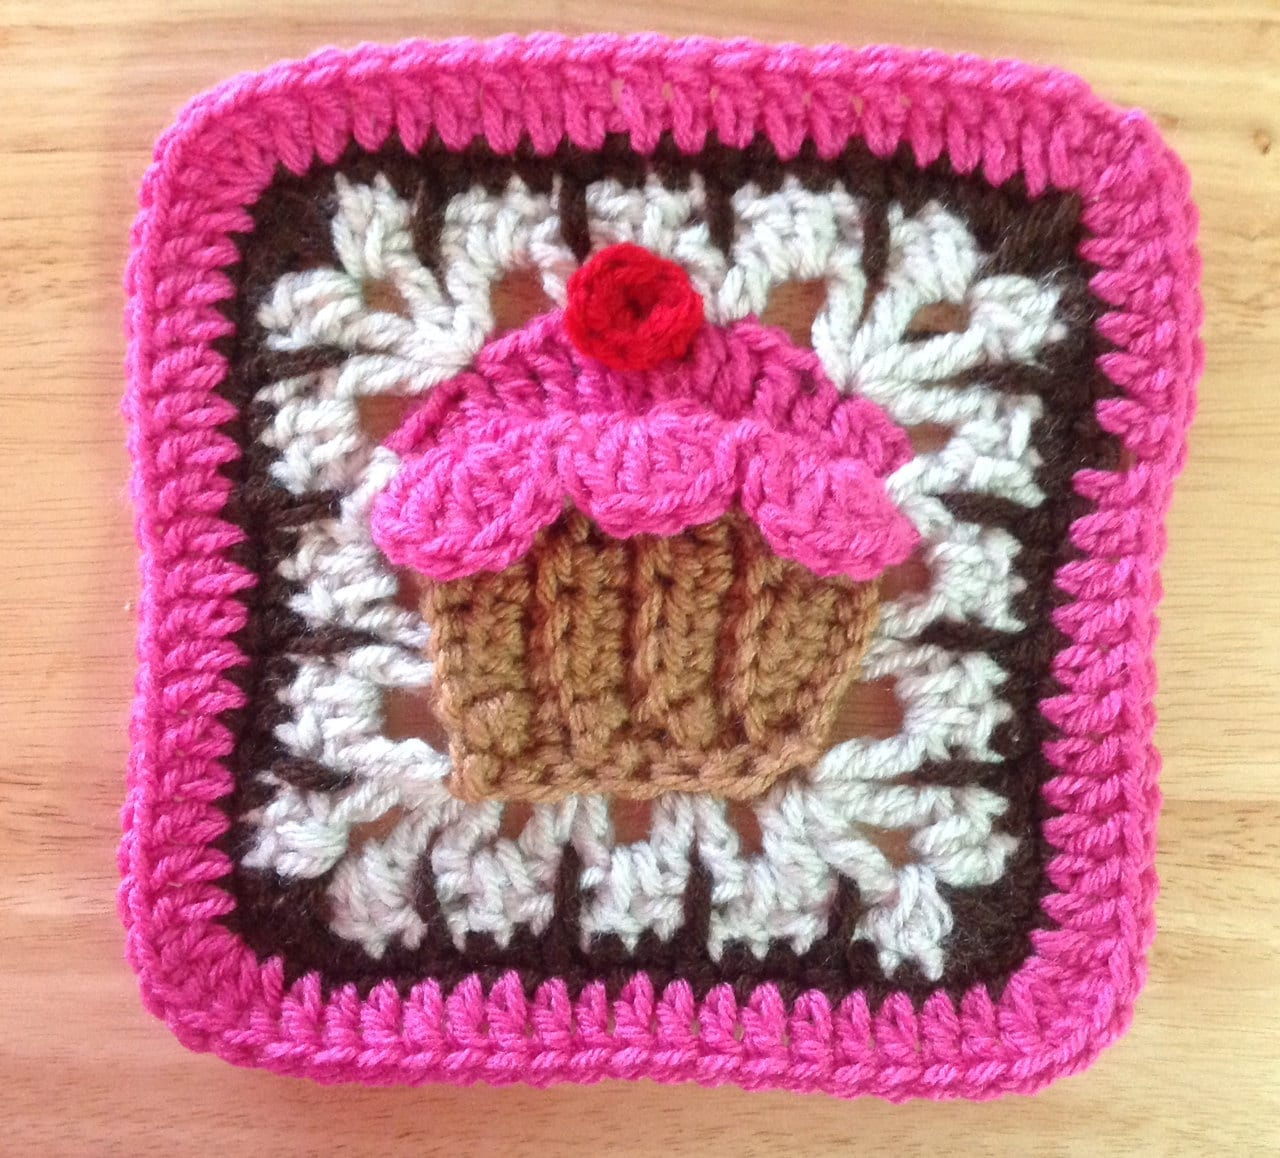 Cupcake Crochet Pattern Awesome Inspiration Design